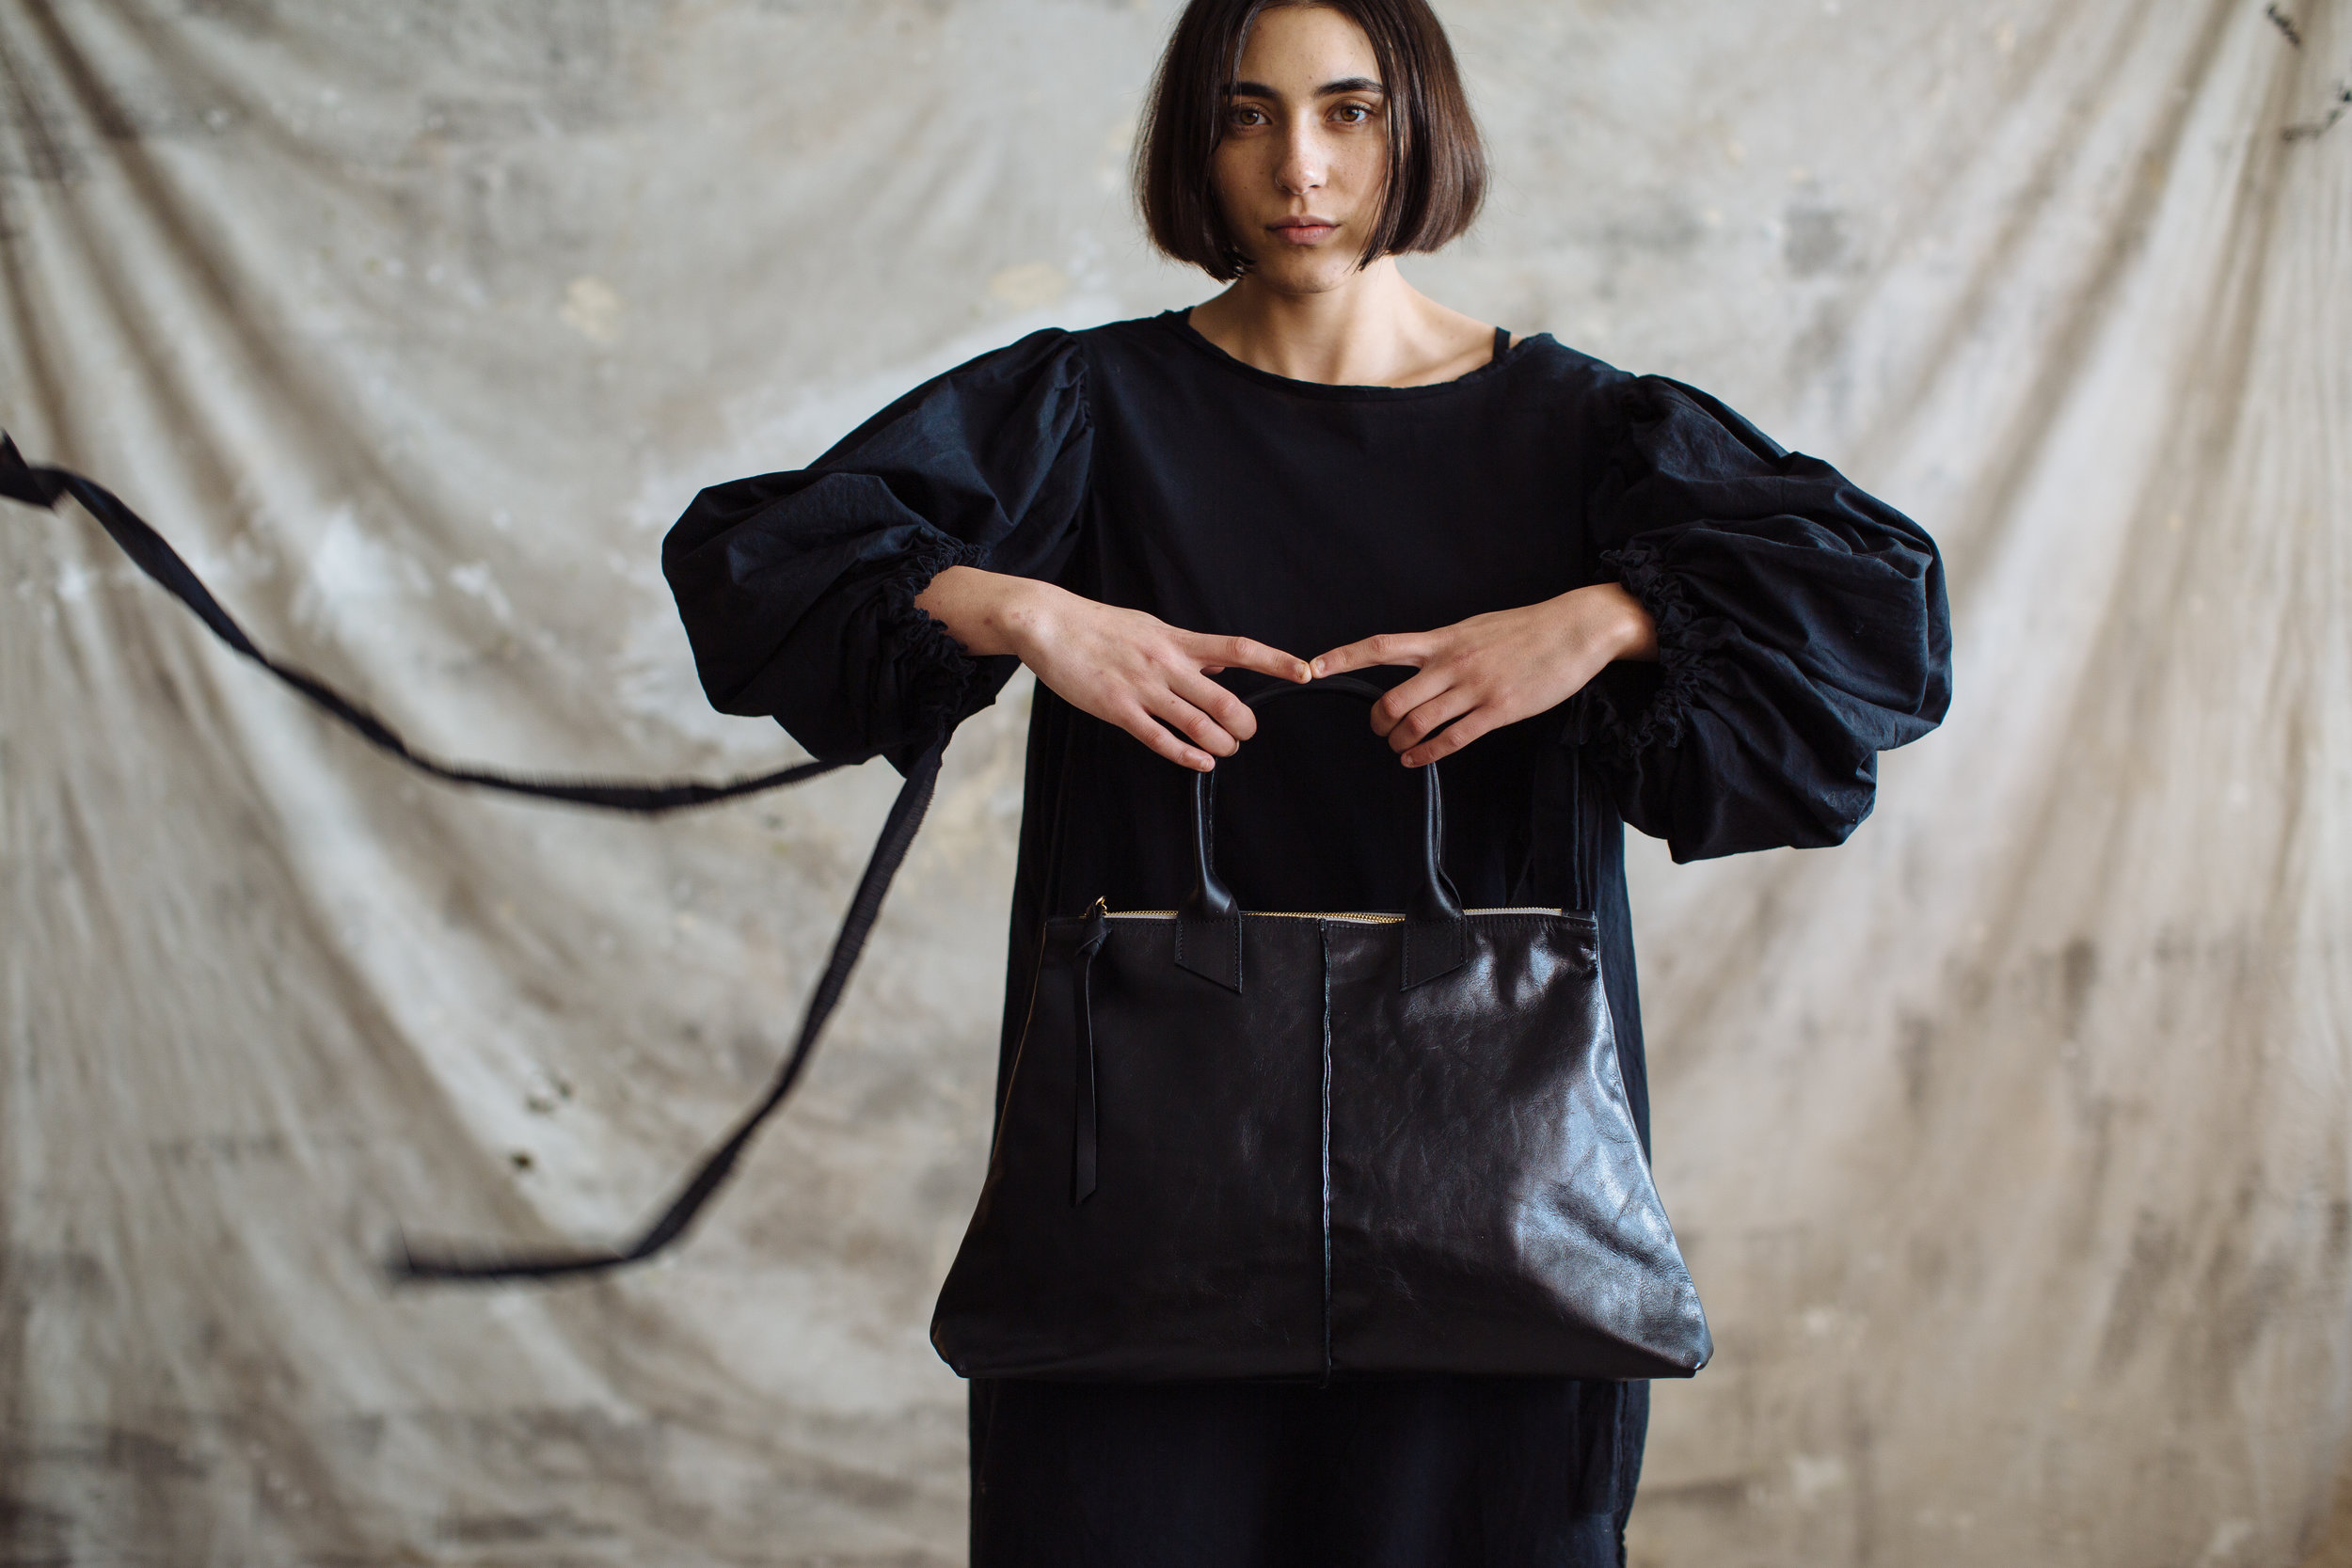 Pennyroyal Phoebe in black veg tan leather